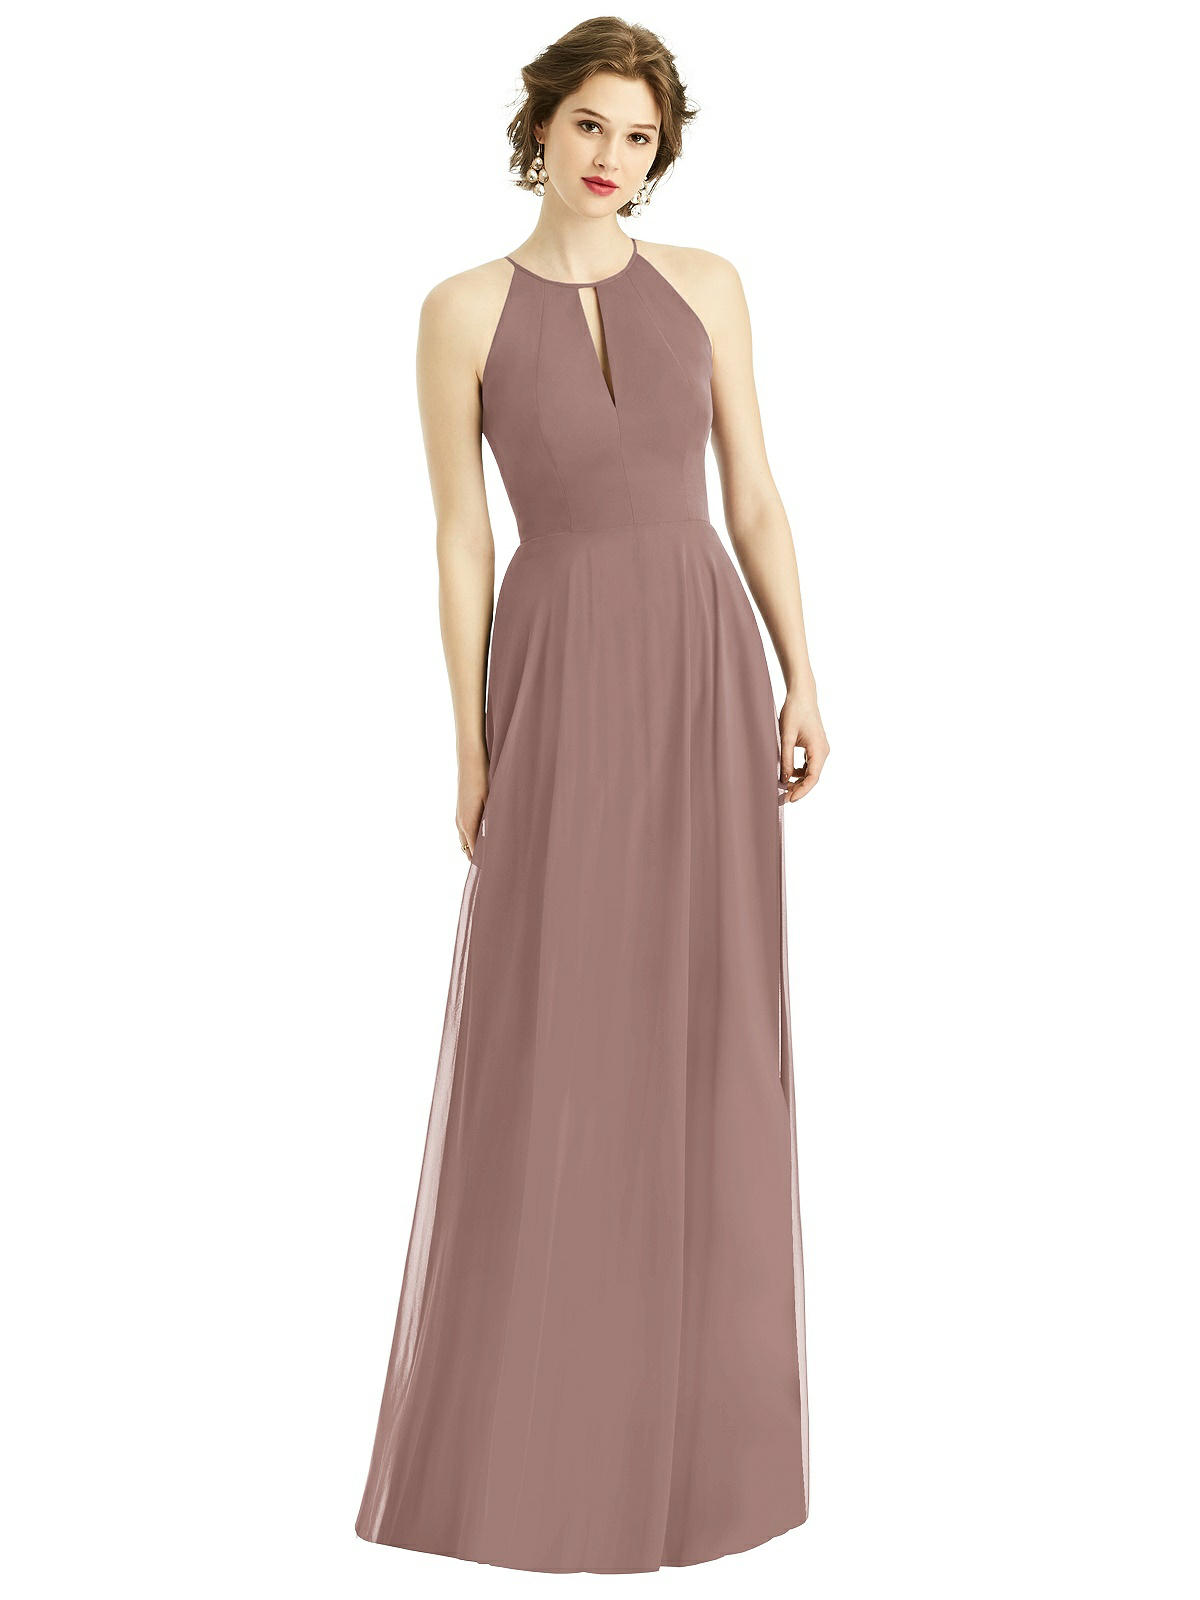 b44254fda2a Mocha Bridesmaid Dresses Uk - Data Dynamic AG